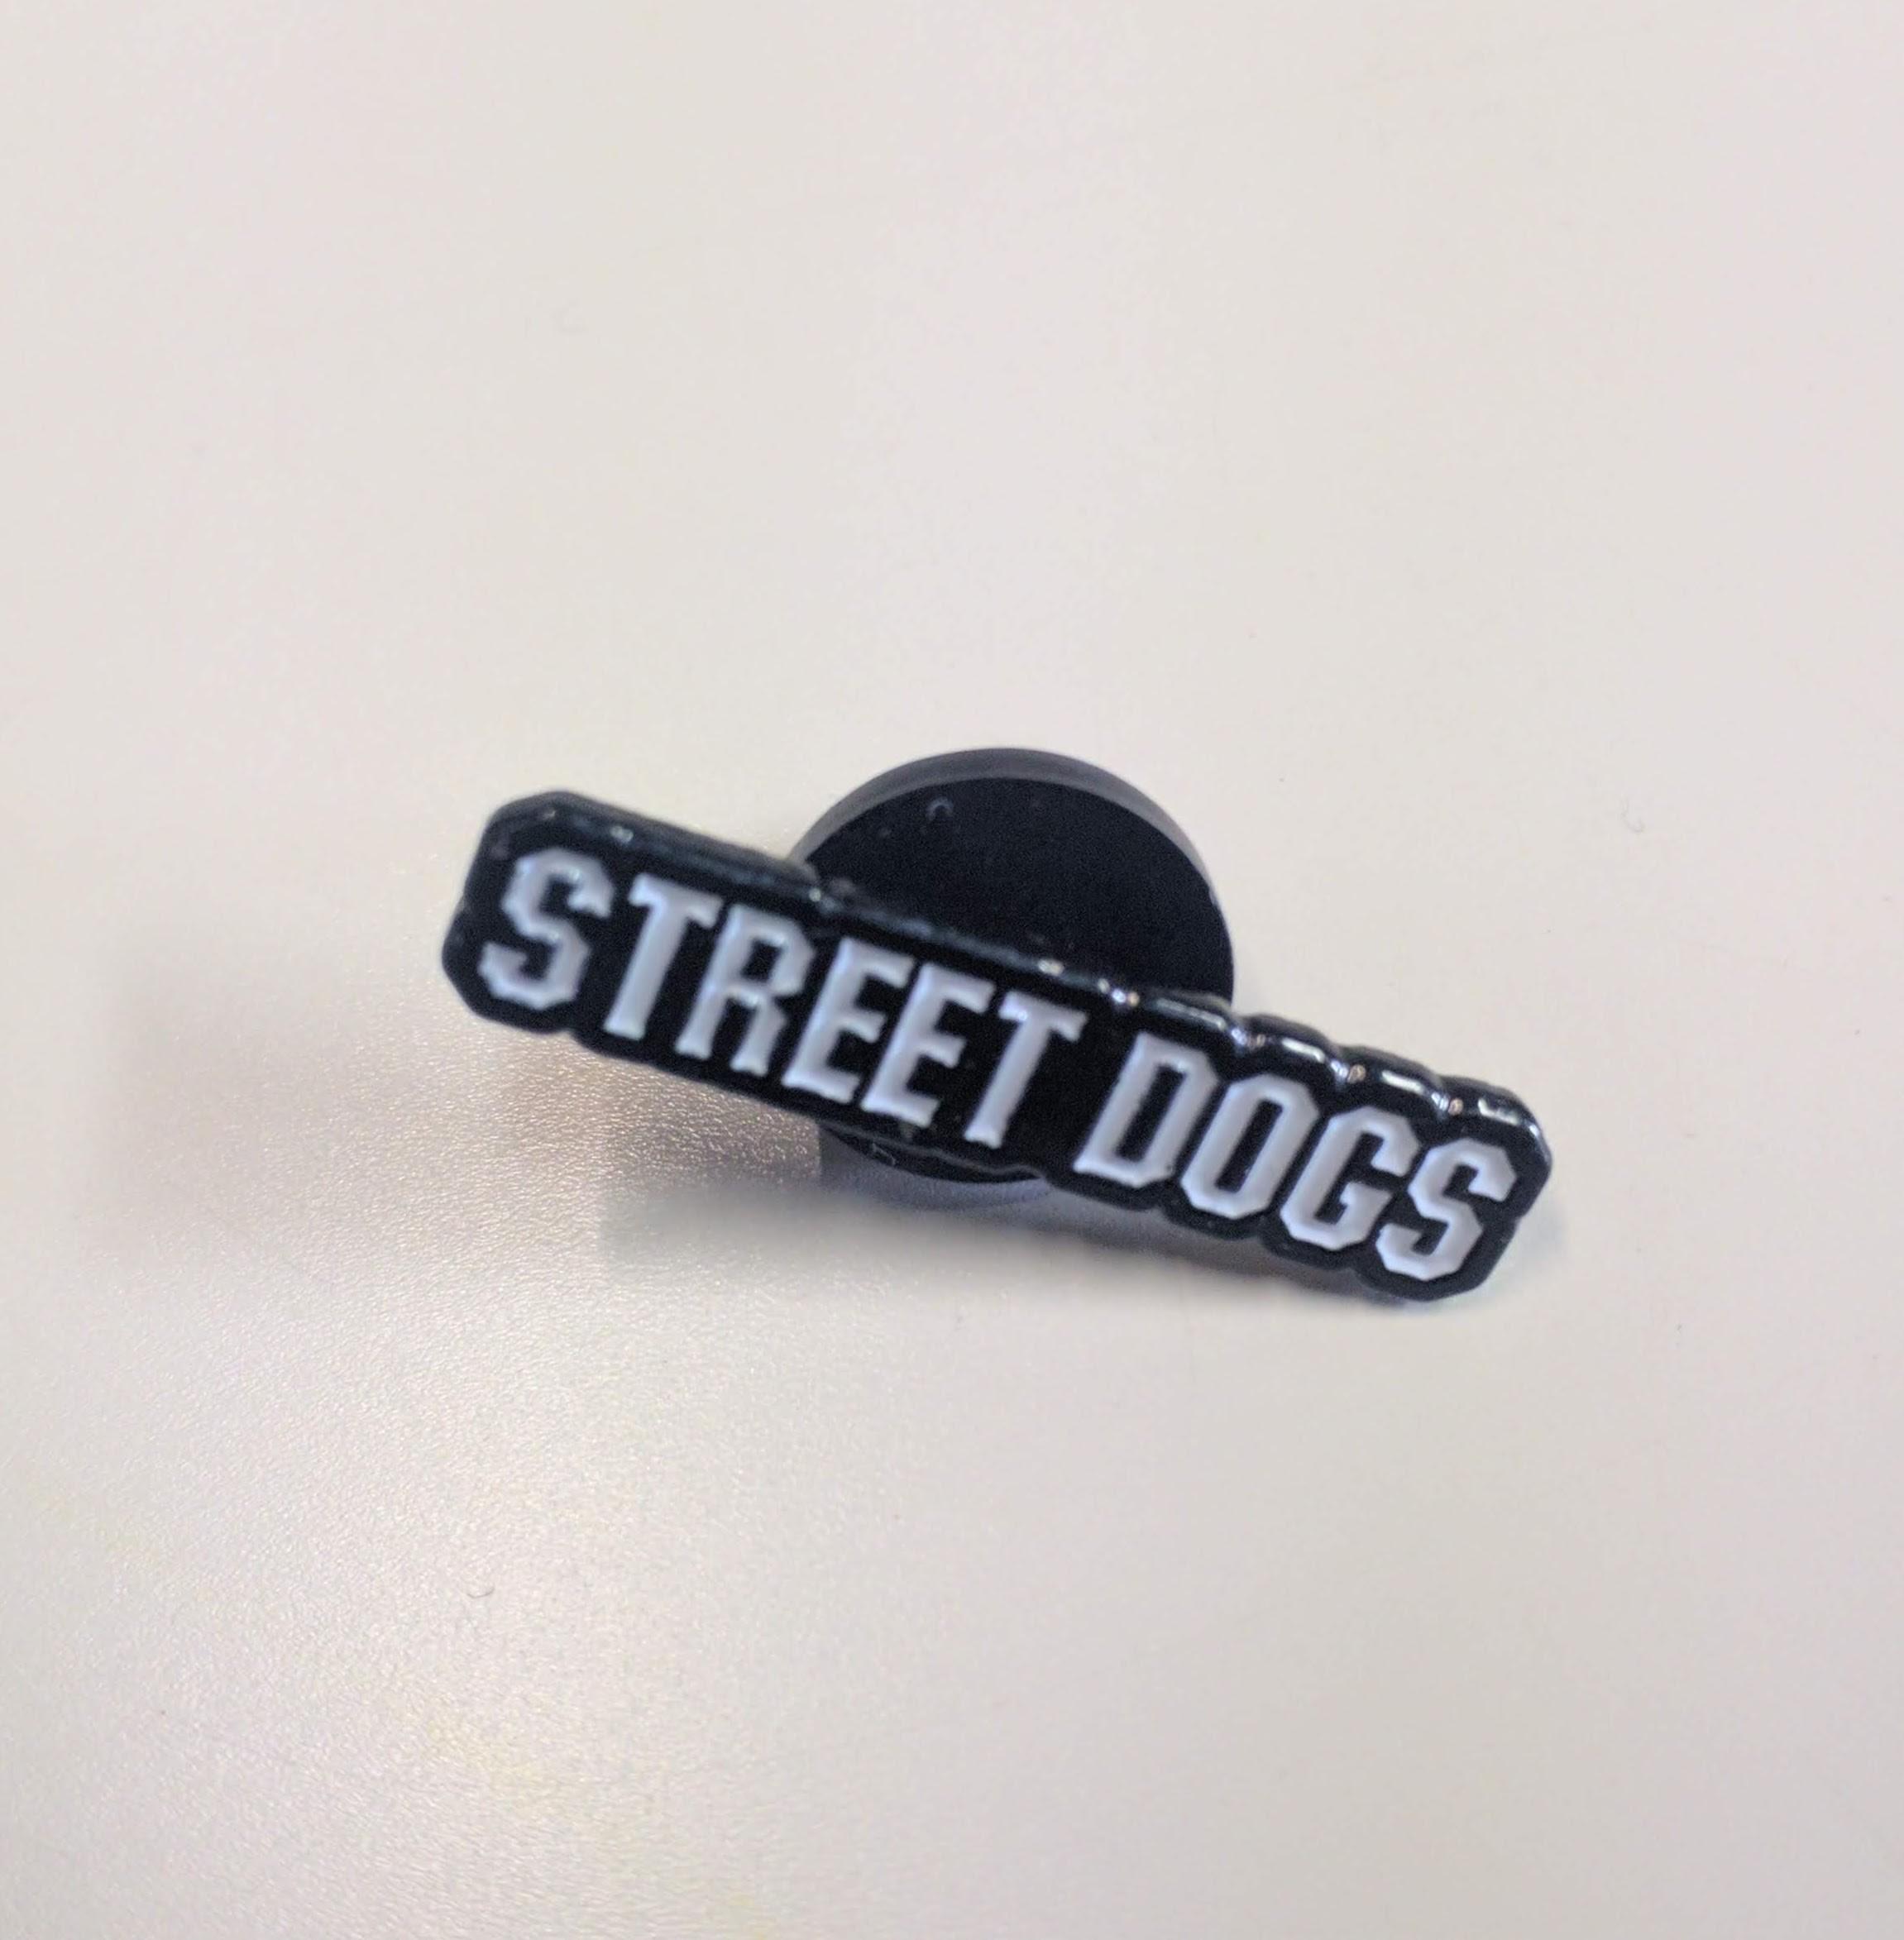 Street Dogs lettering - Metal-Pin